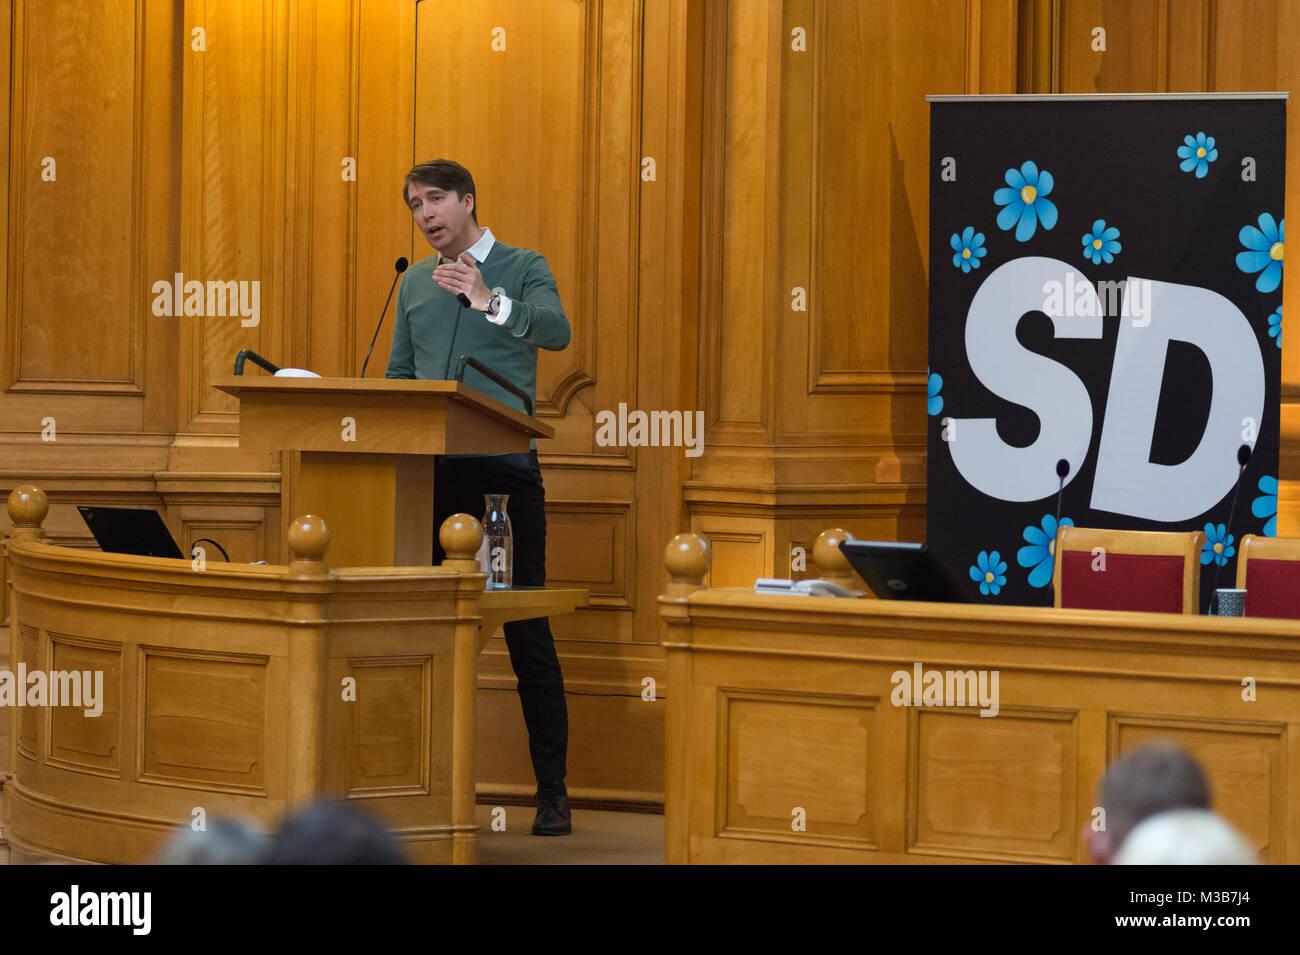 Stockholm, Sweden, 10th February, 2018. 'Future Conference' Sweden Democrats (SD) (Sverigedemokraterna) - Stock Image